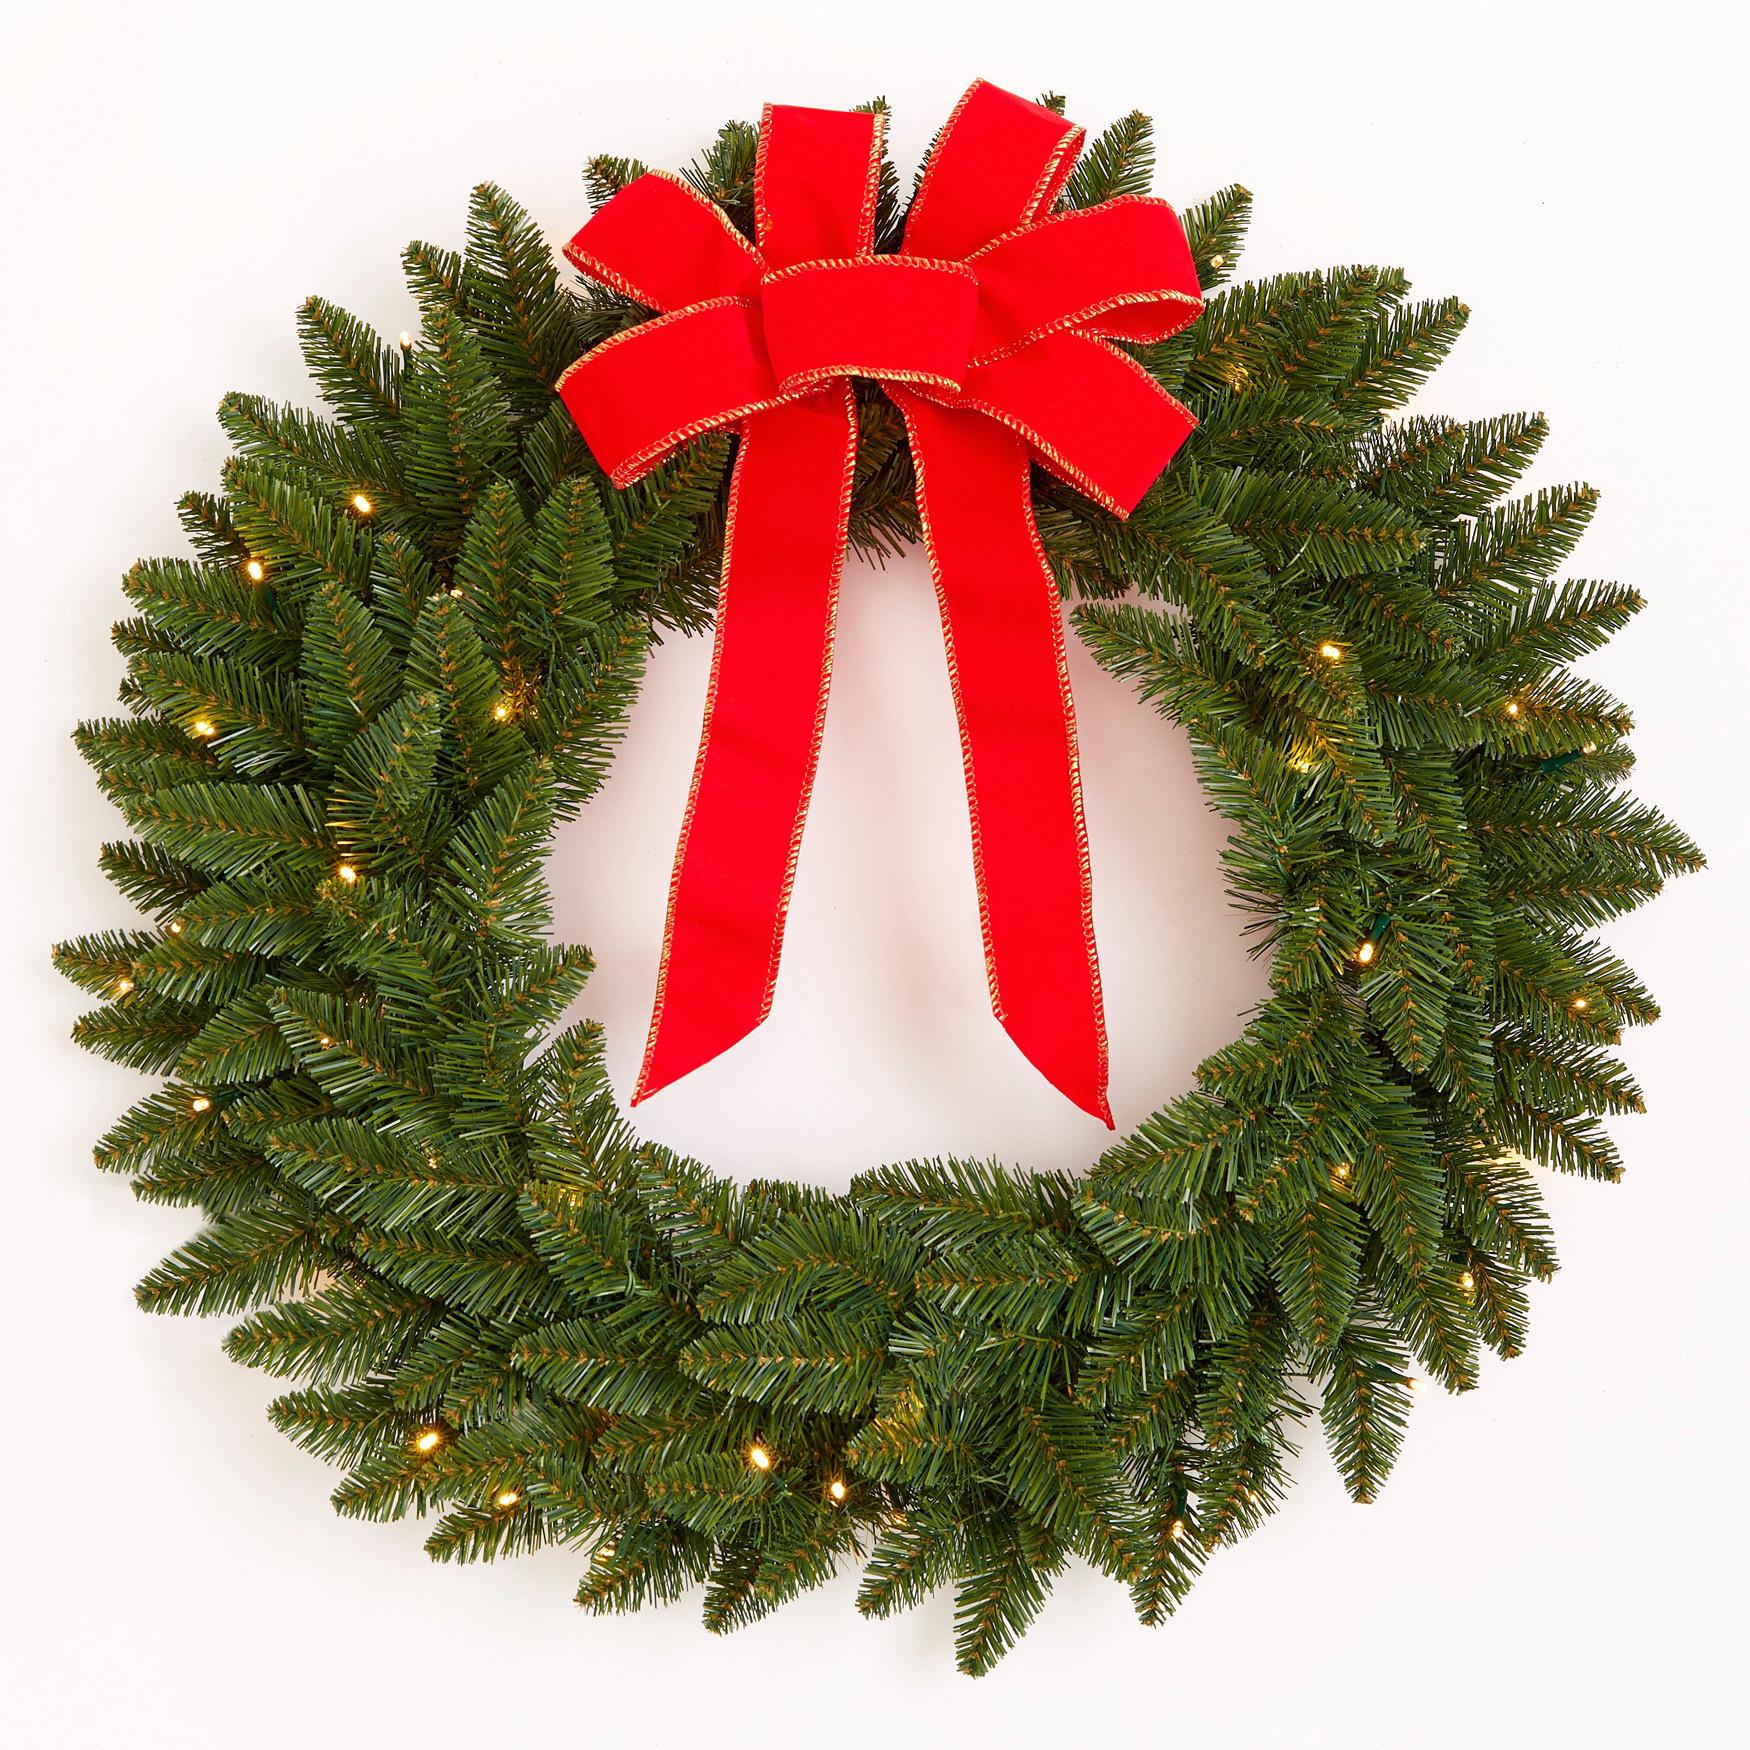 BrylaneHome Christmas Banister Garland Ties Set of 3 Green